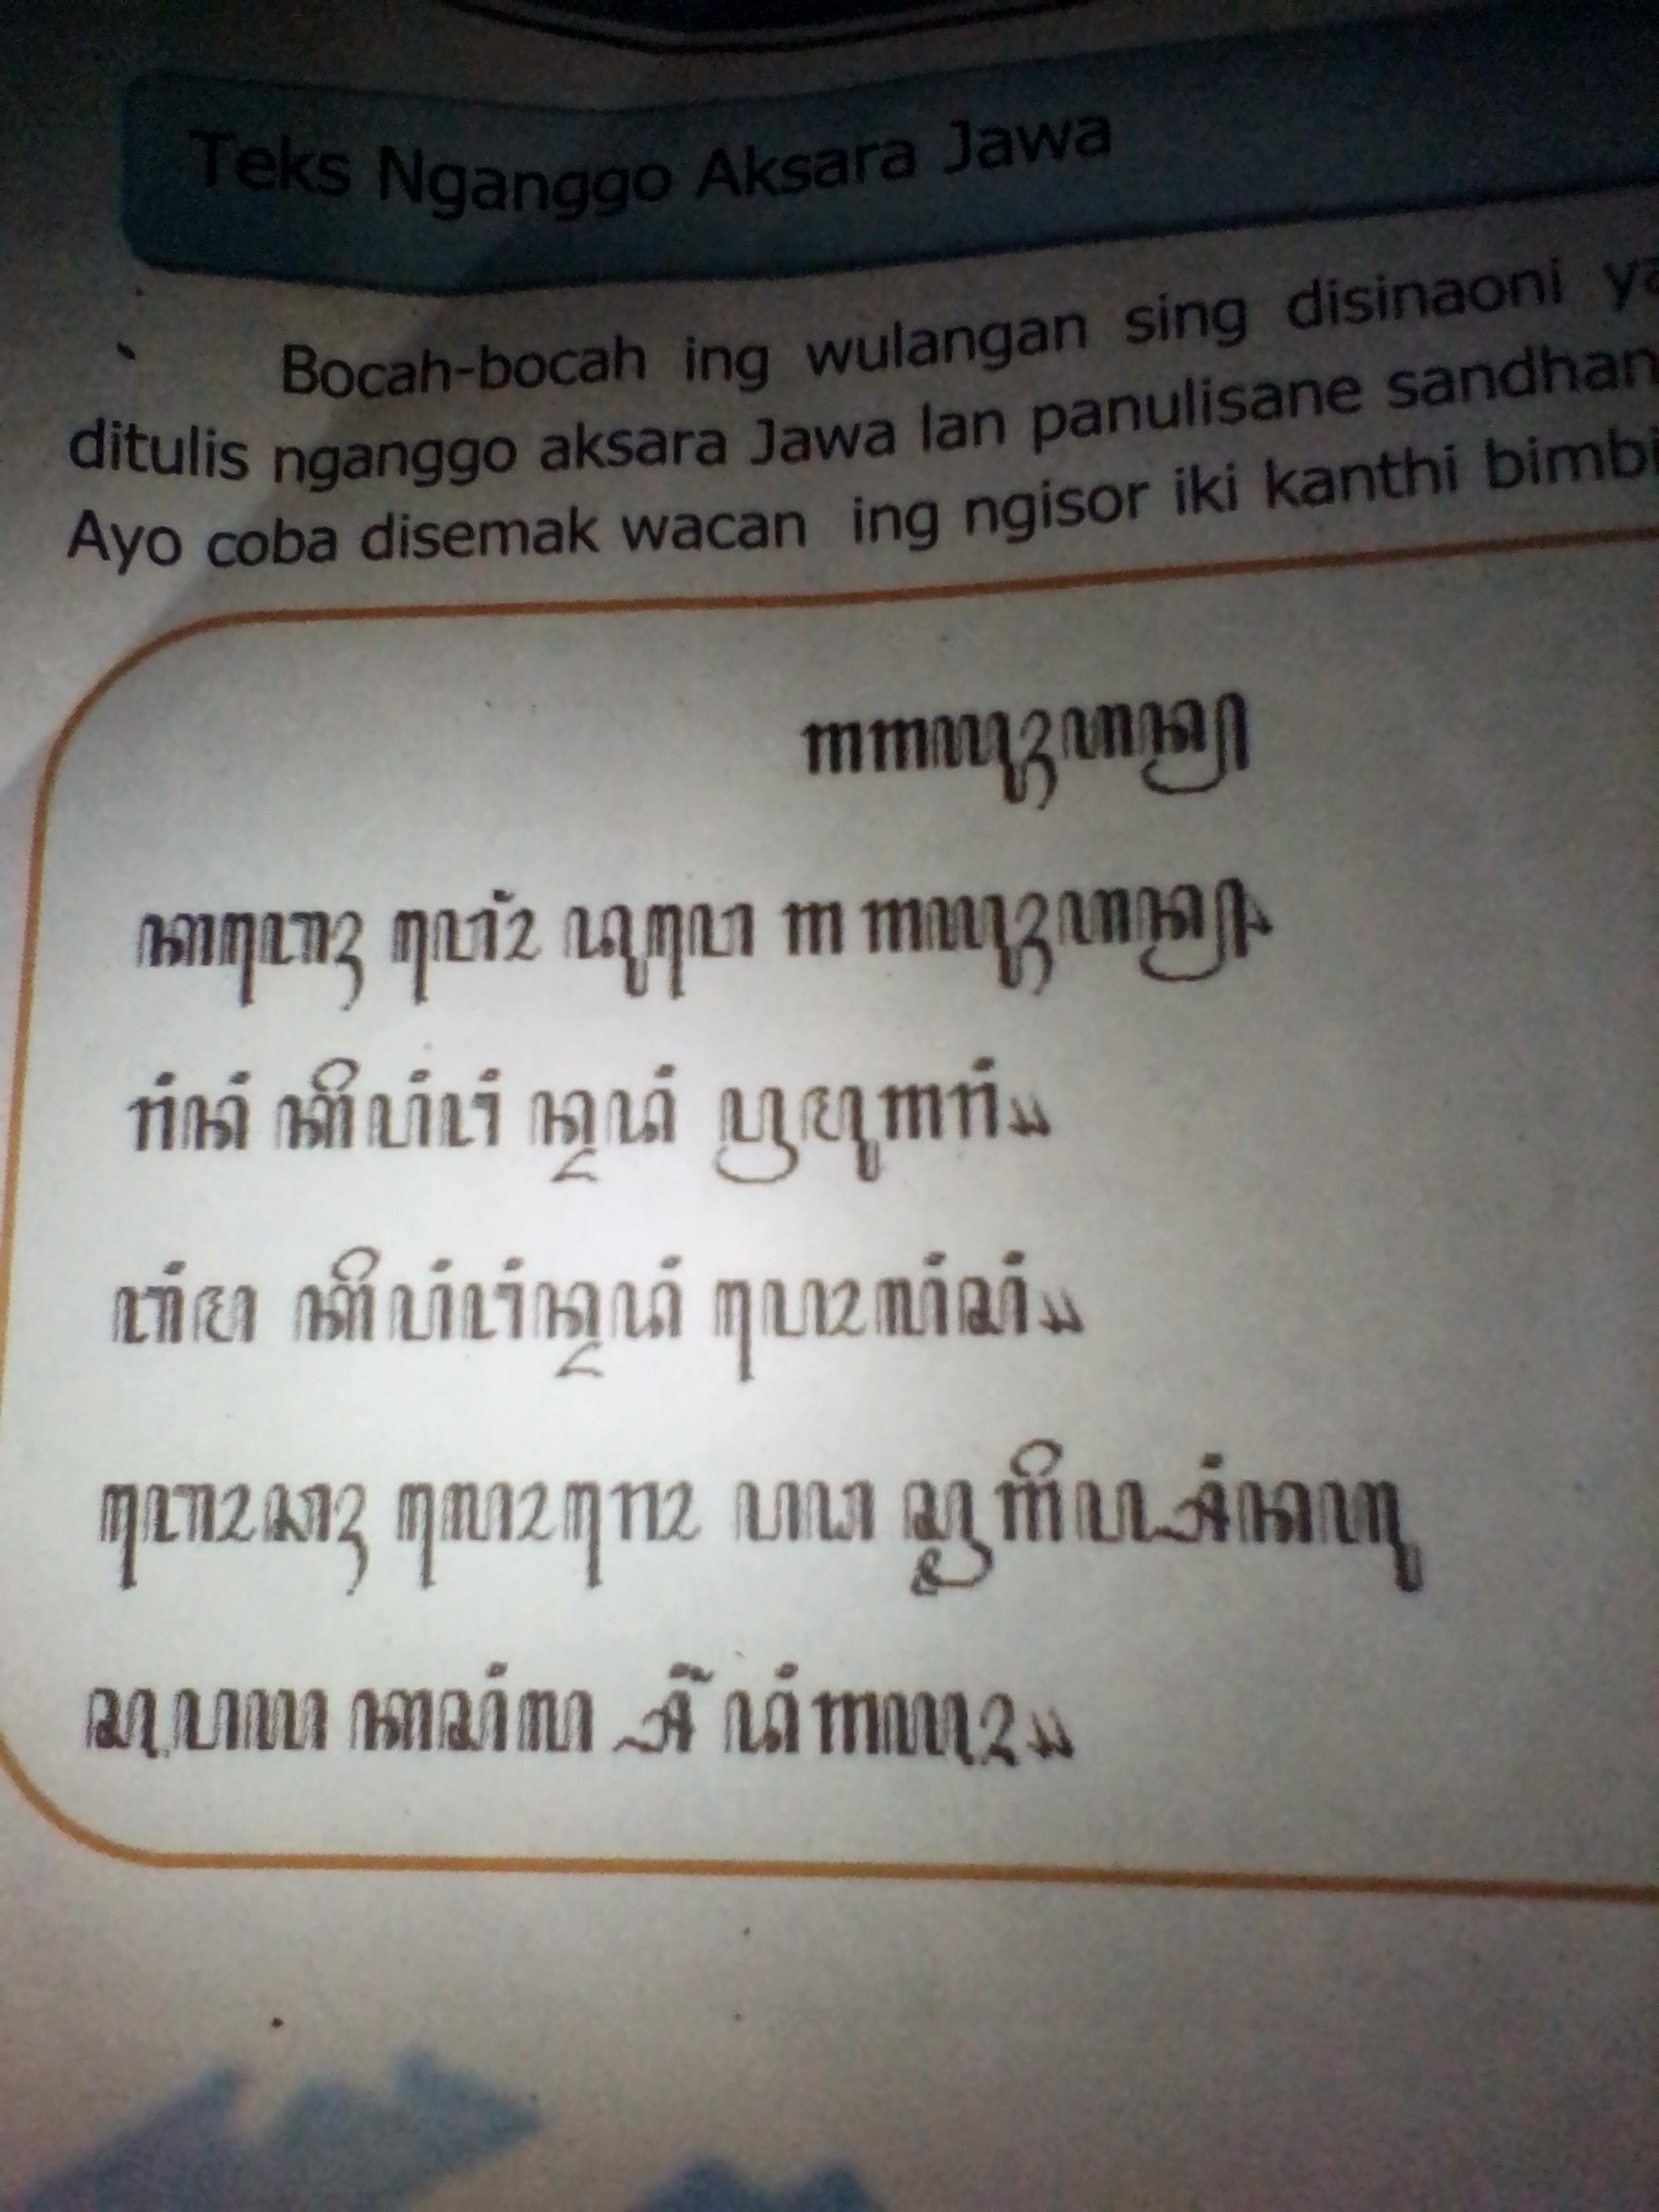 Ada Yg Menterjemahkan Tlng Yg Bisa Di Bantu Tantri Basa Kelas 4 Sd Brainly Co Id